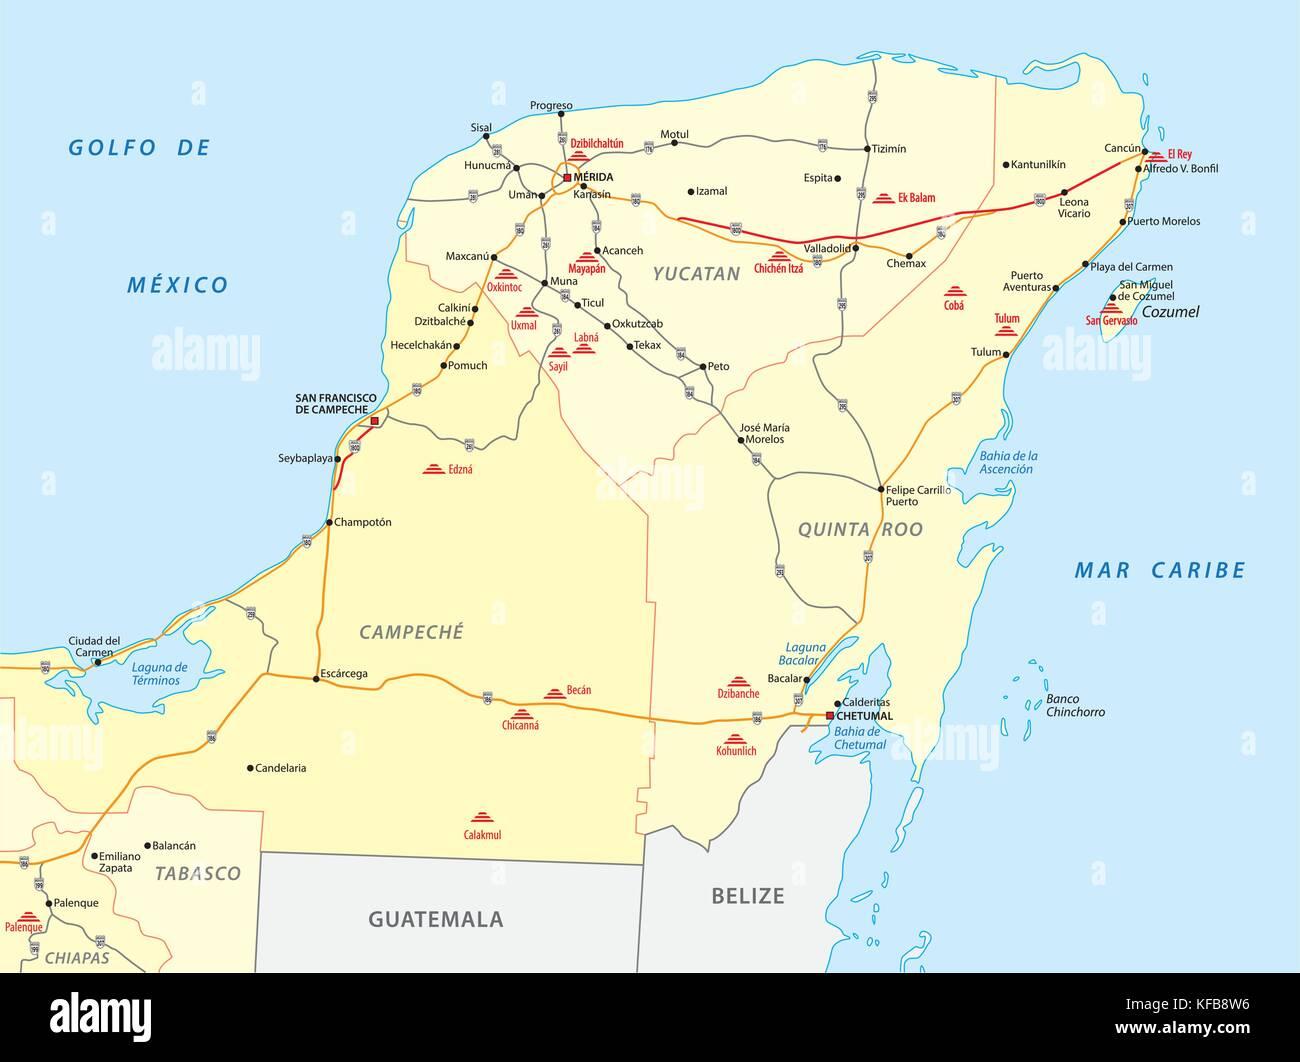 yucatan karte Karte von Yucatan mit den wichtigsten Maya Ruinen Vektor Abbildung  yucatan karte